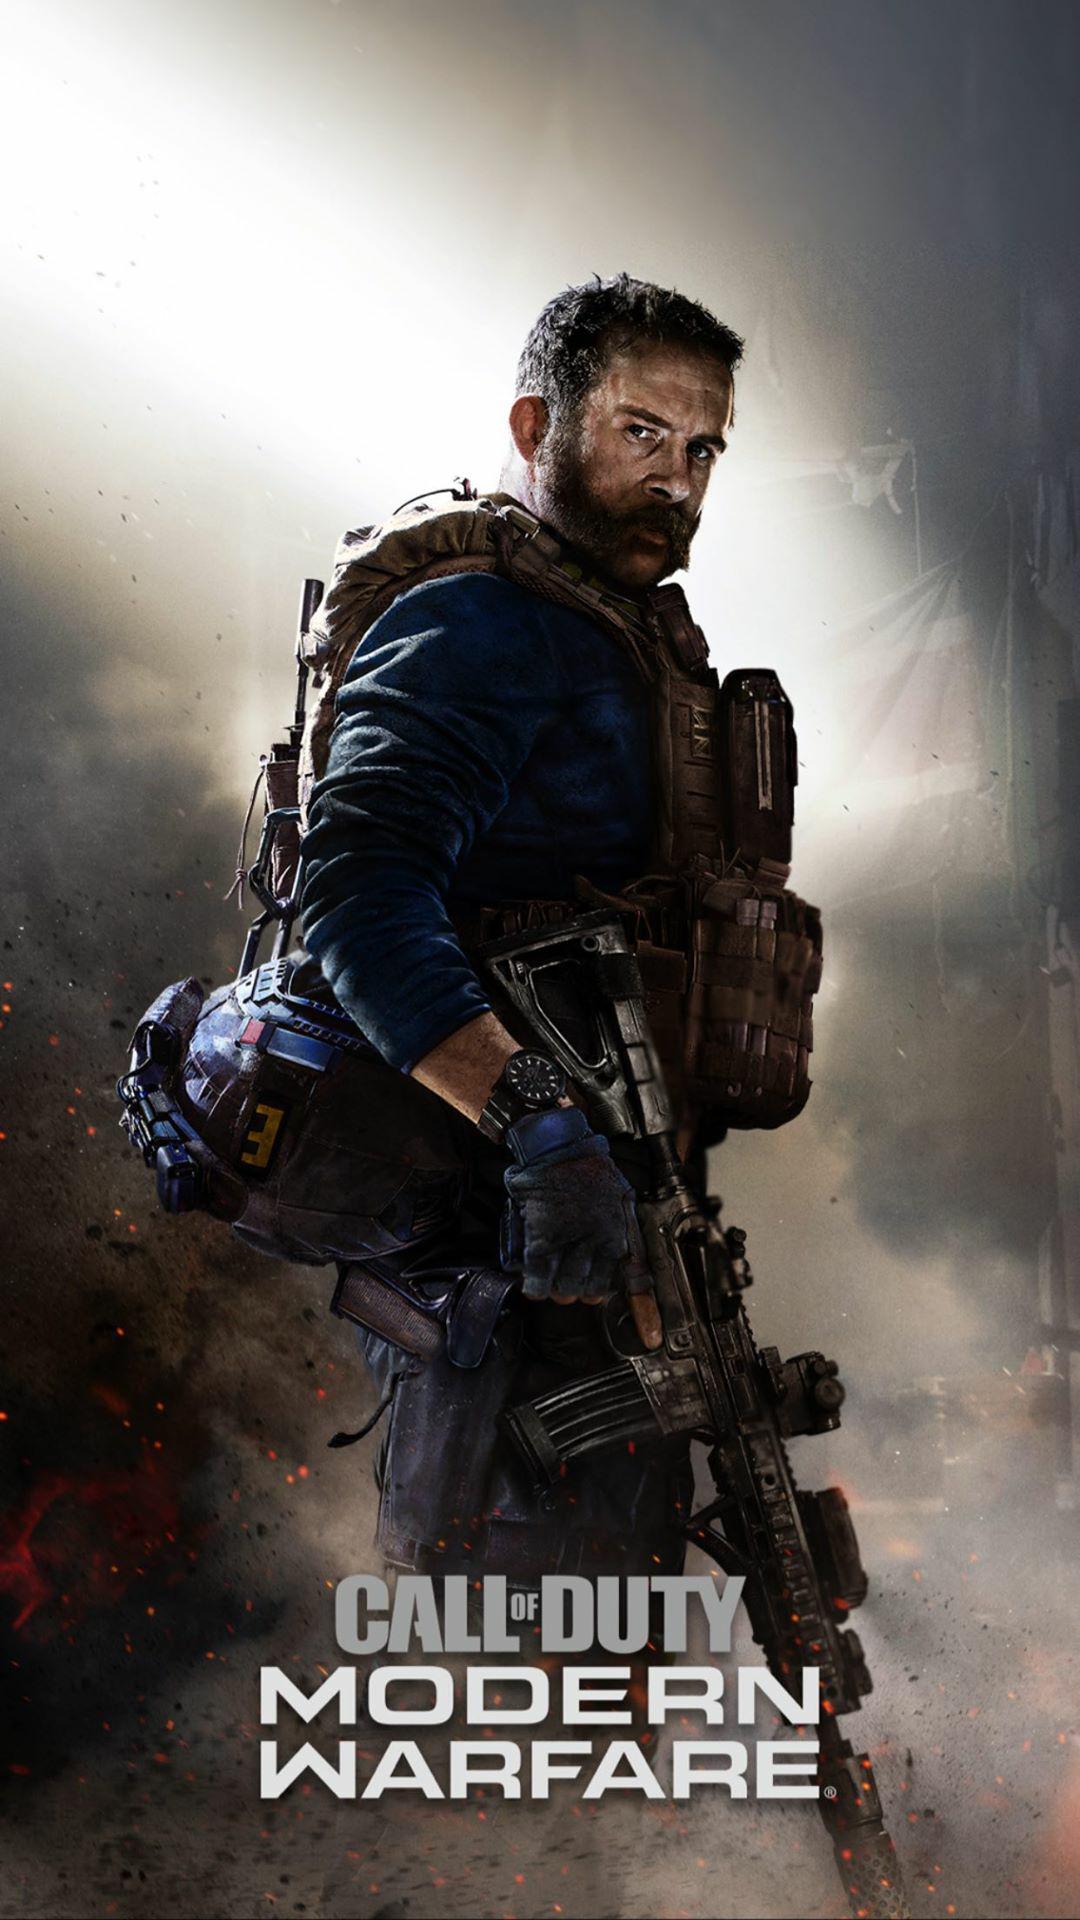 510 Call Of Duty Ideas In 2021 Call Of Duty Infinite Warfare Warfare